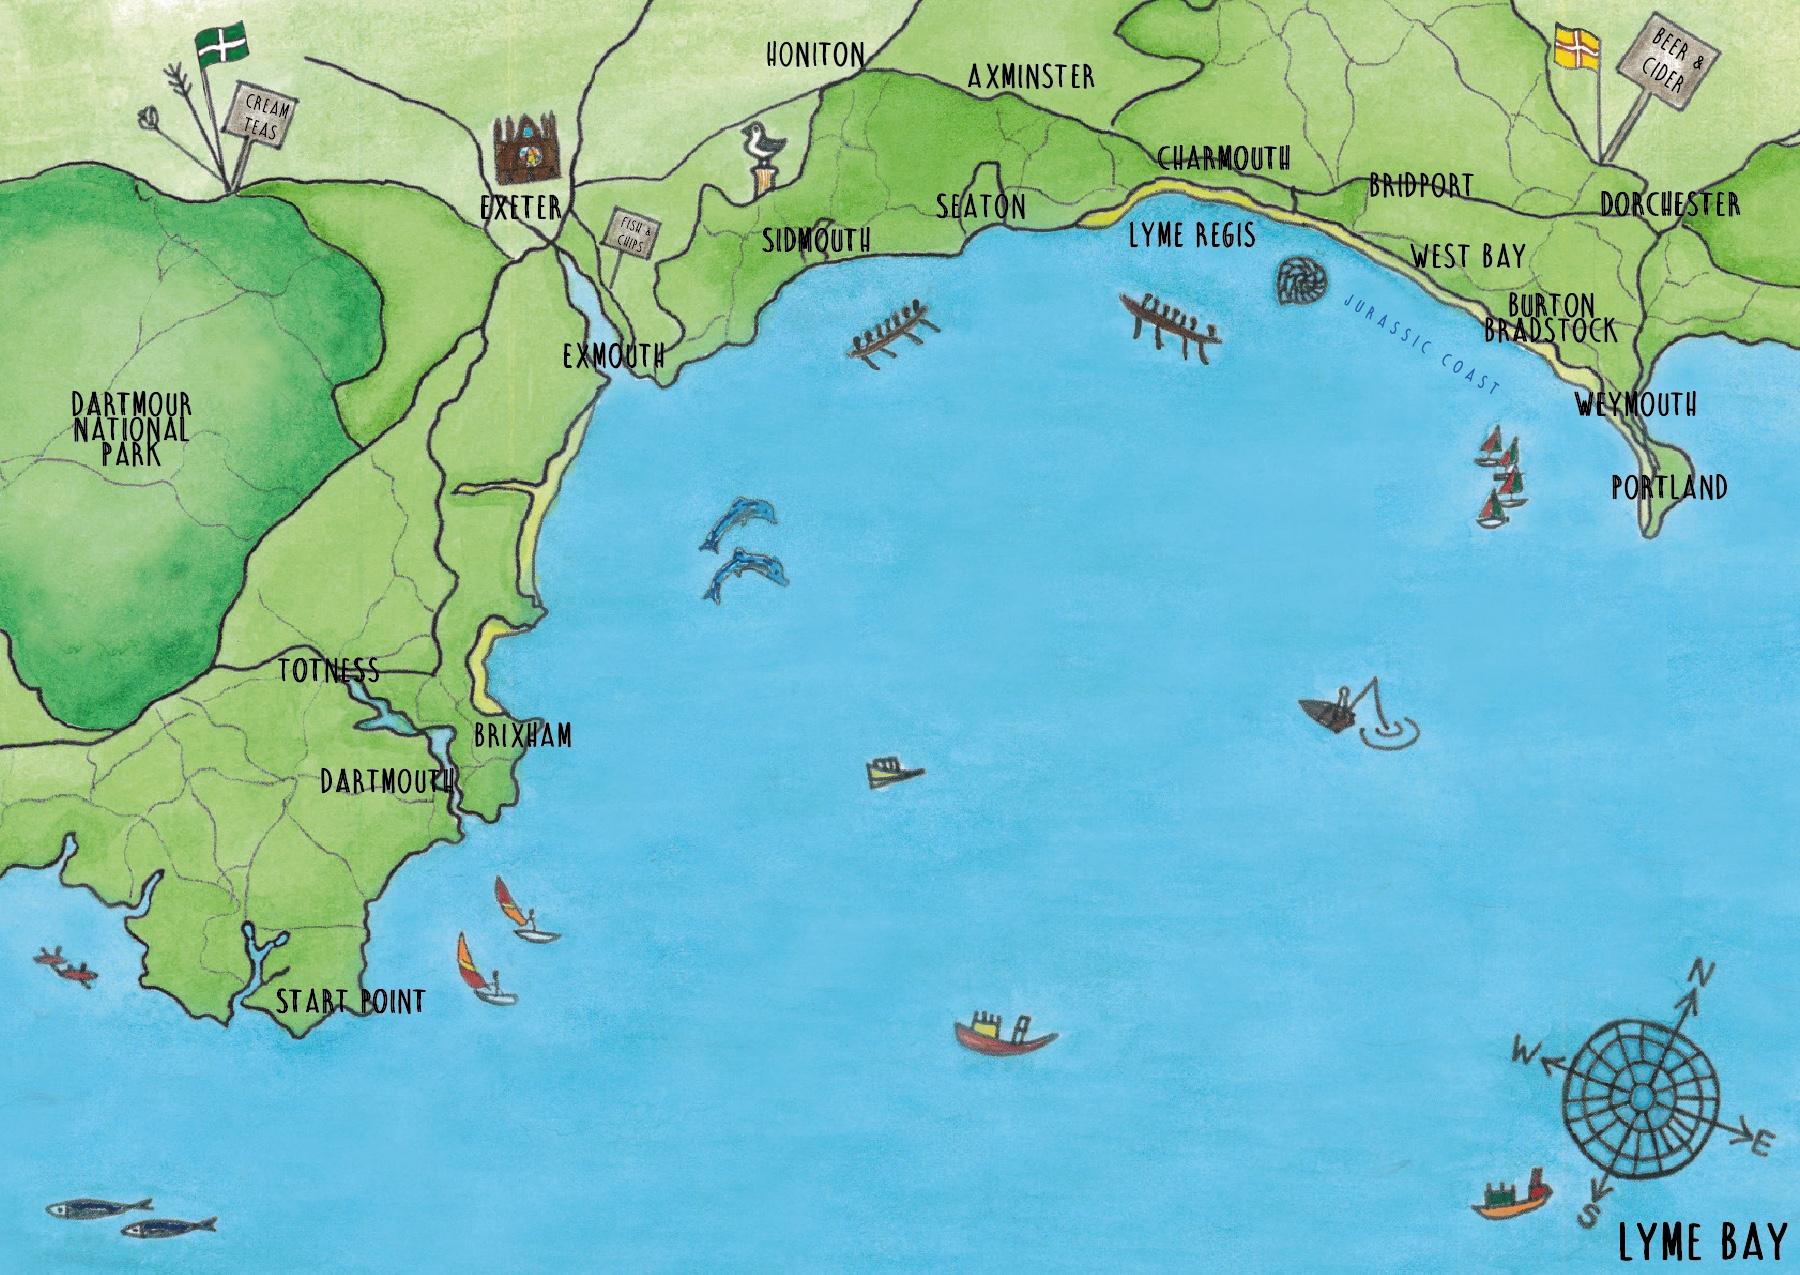 Lyme Bay Map - Tabitha Stead